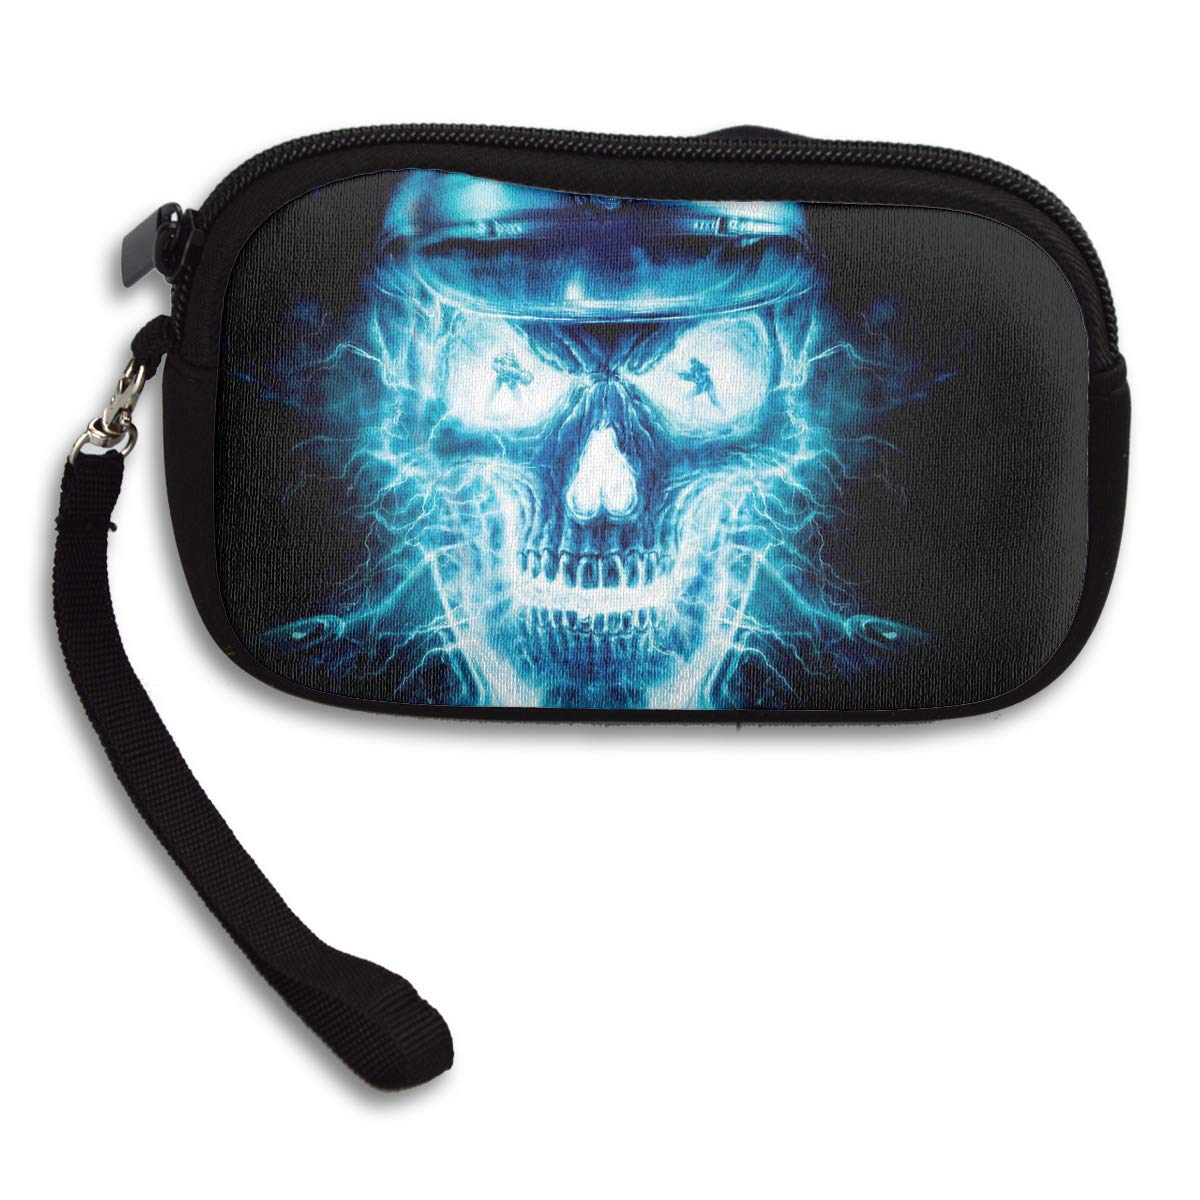 Blue Flaming Skull Coin Pouch Clutch Purse Wristlet Wallet Phone Card Holder Handbag